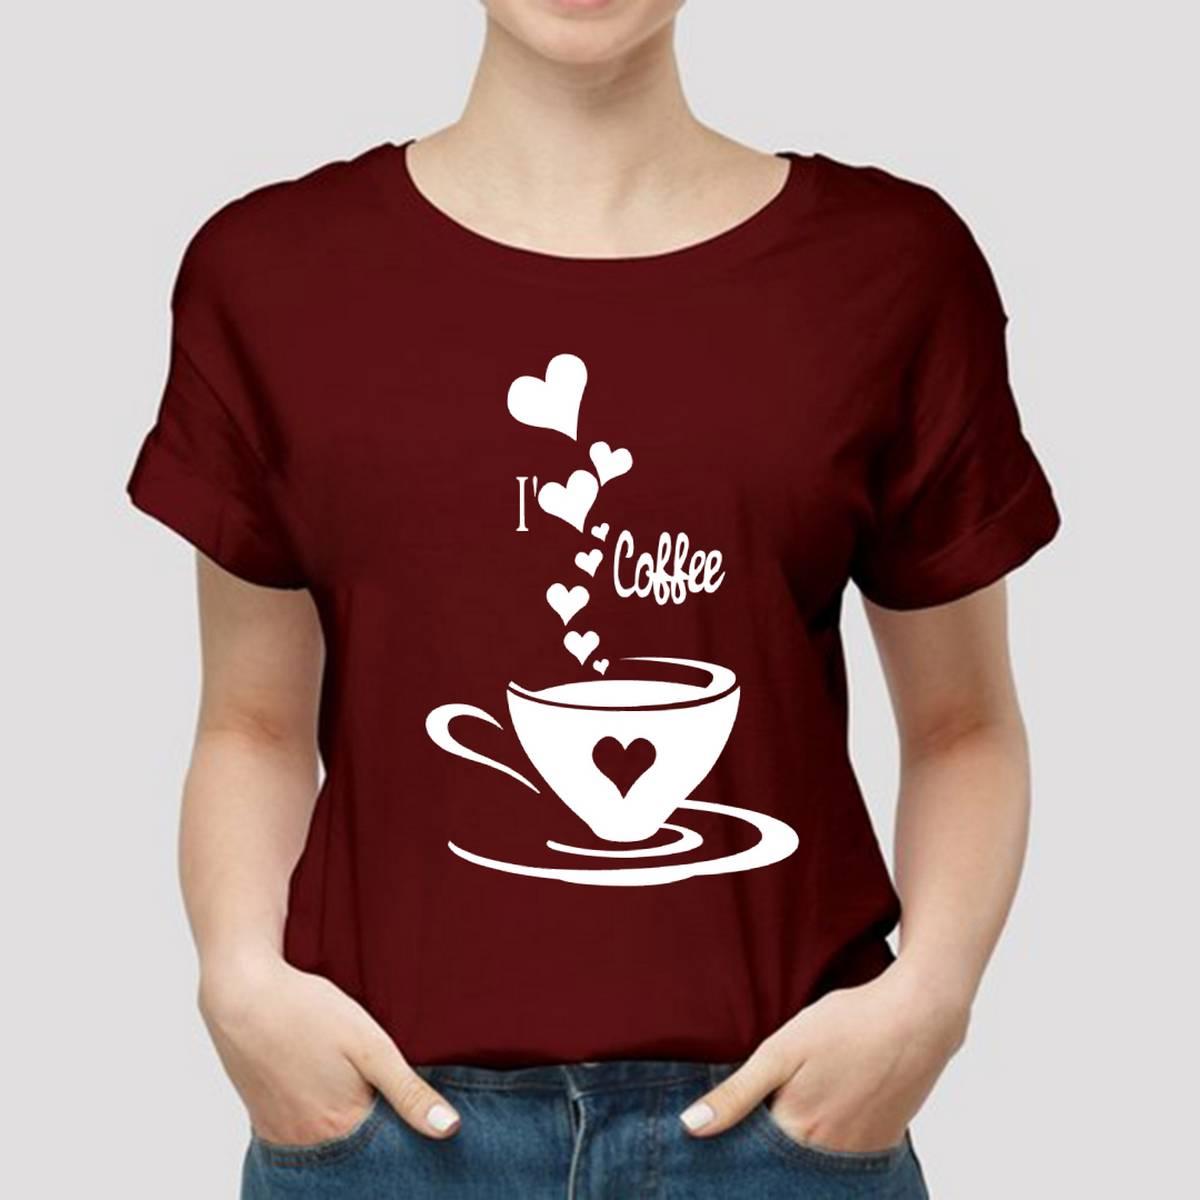 Classy TEA Theme Tag Print Mustard Colored Summer Top Half Sleeve Tee Shirt Round Neck Cotton Trendy T-shirt Casual Tshirt Spring Wear Smart Fit Half Sleeve Tee Shirt for Women/Girls